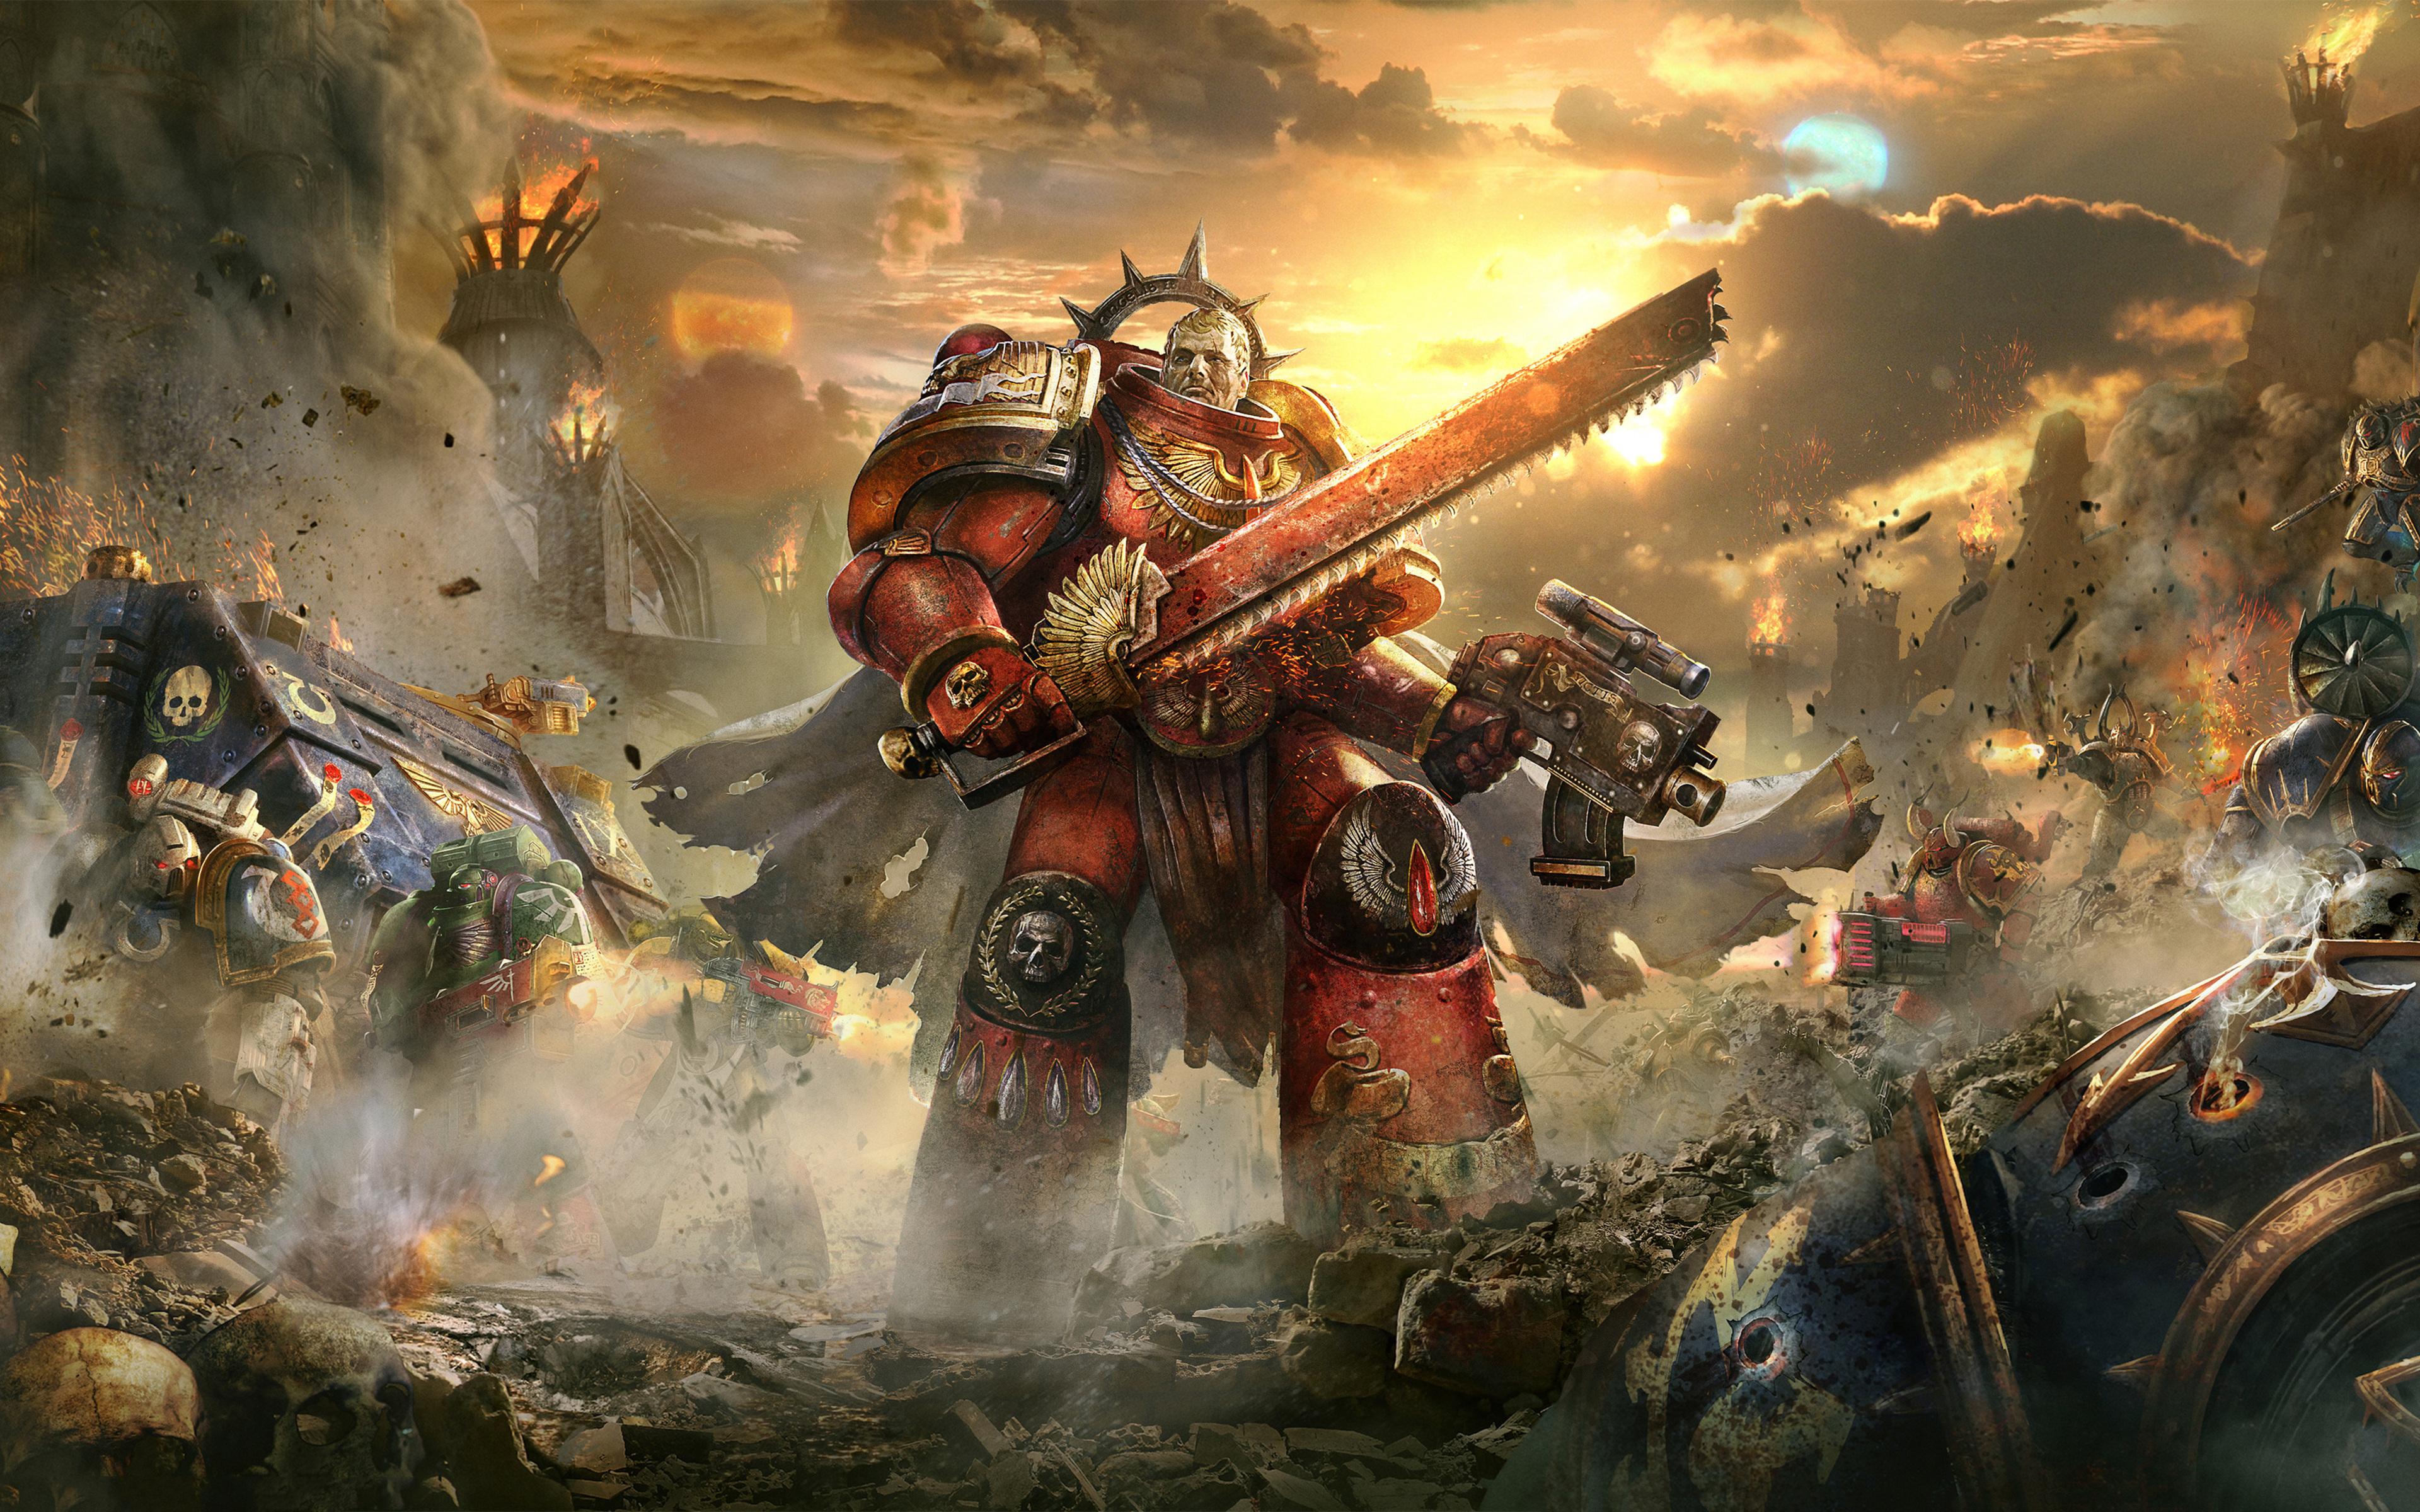 Warhammer Обои На Рабочий Стол